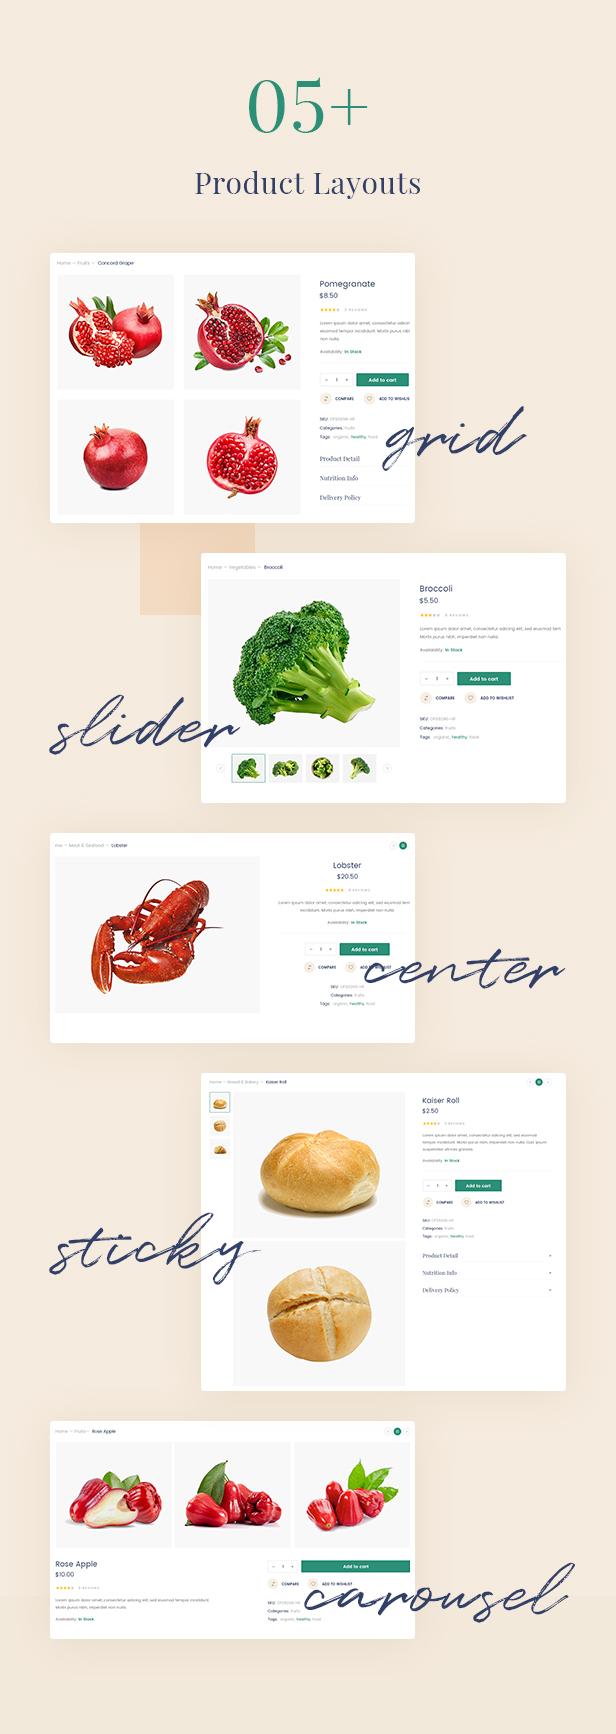 04-desc-product-layouts